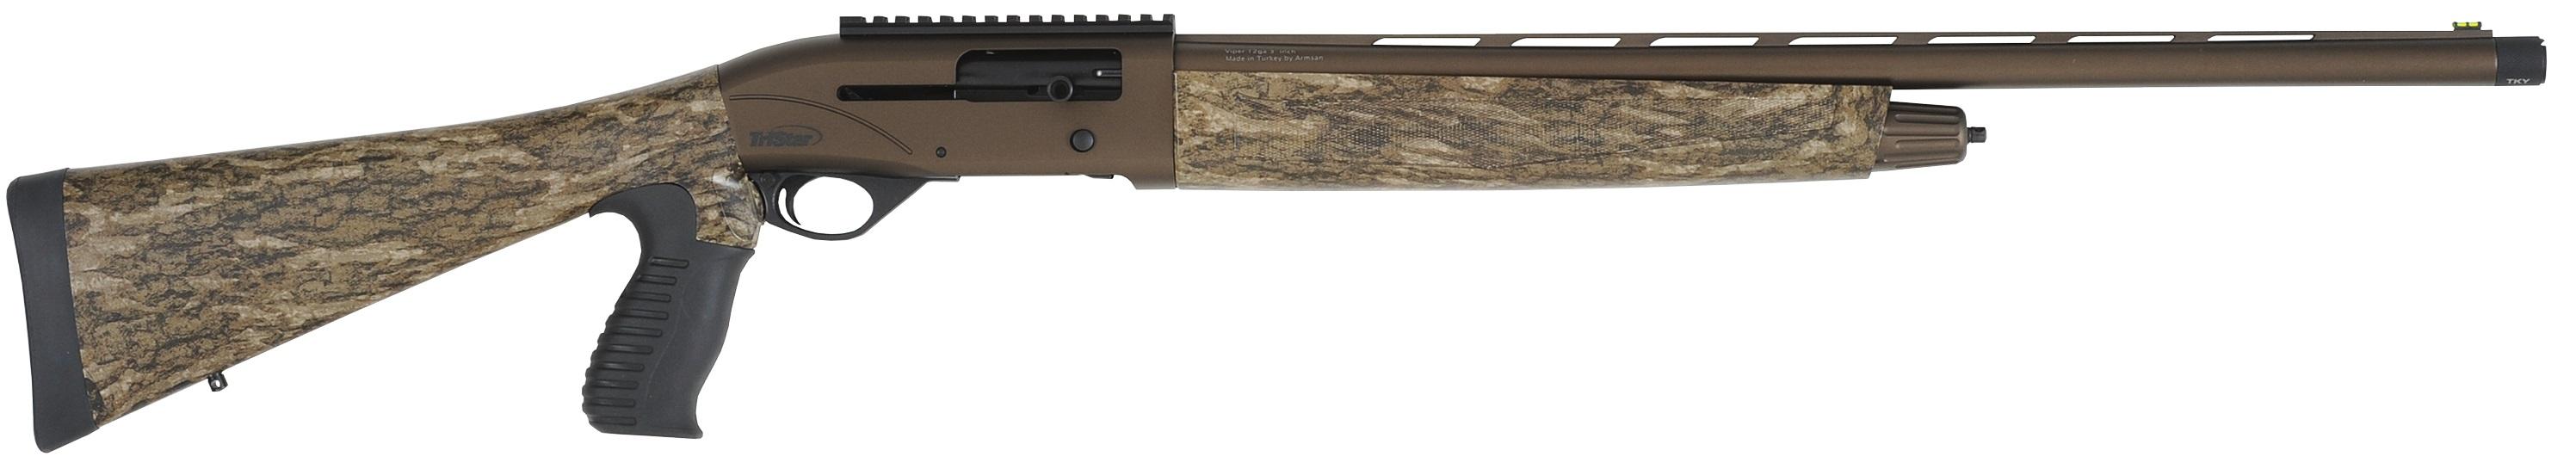 TriStar Sporting Arms Viper G2 Turkey 12 Gauge